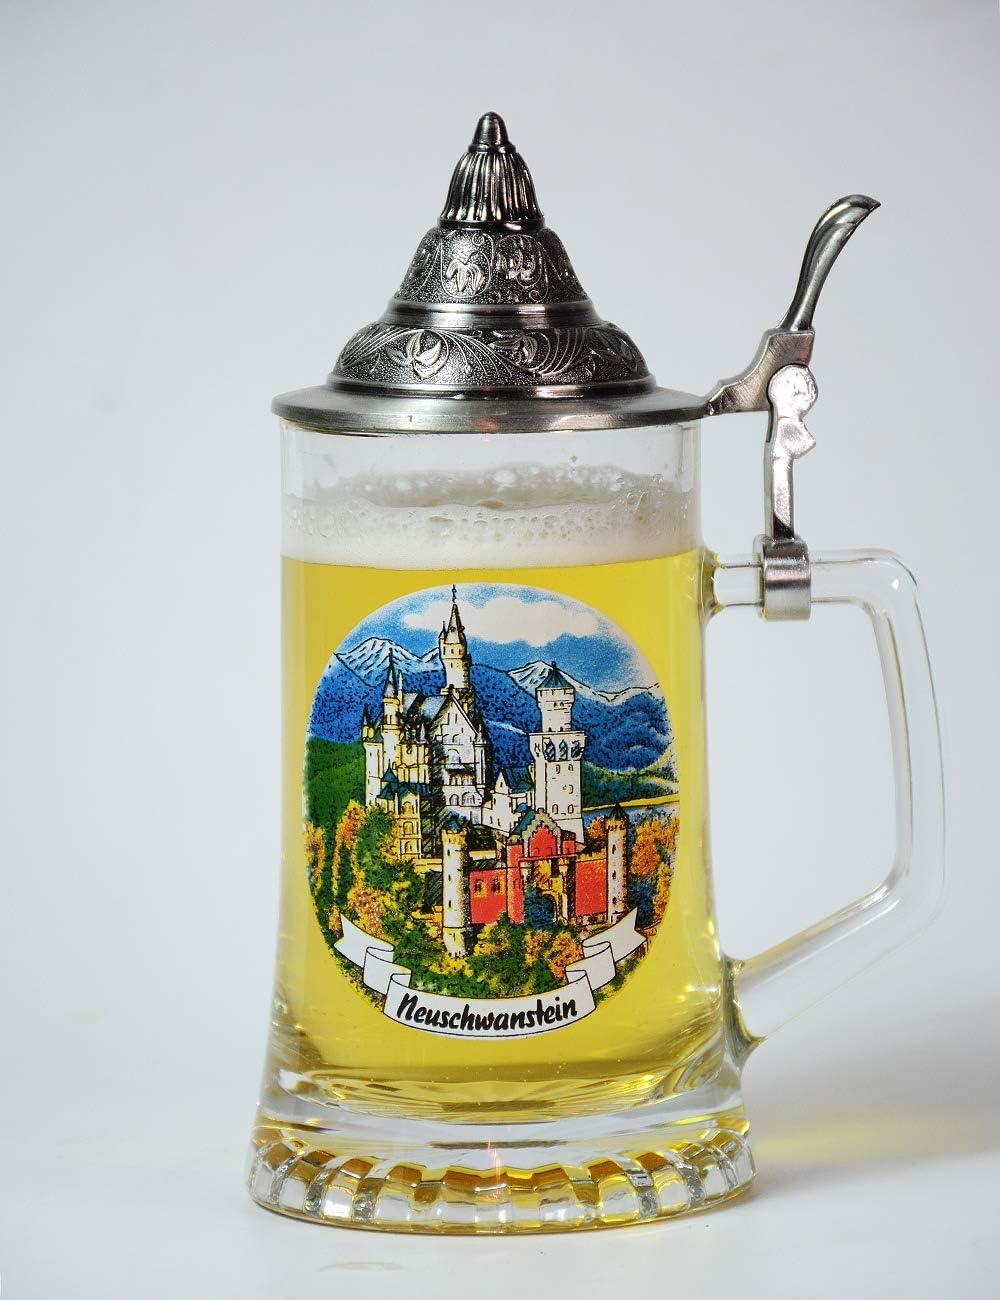 Amoy-Art Jarra de Cerveza Alemana con Estaño Tapa Hecho a Mano Regalo Souvenir Castillo Neuschwanstein Pintados Estándar de Seguridad Alimentaria Caja de Regalo 0.45 Litre